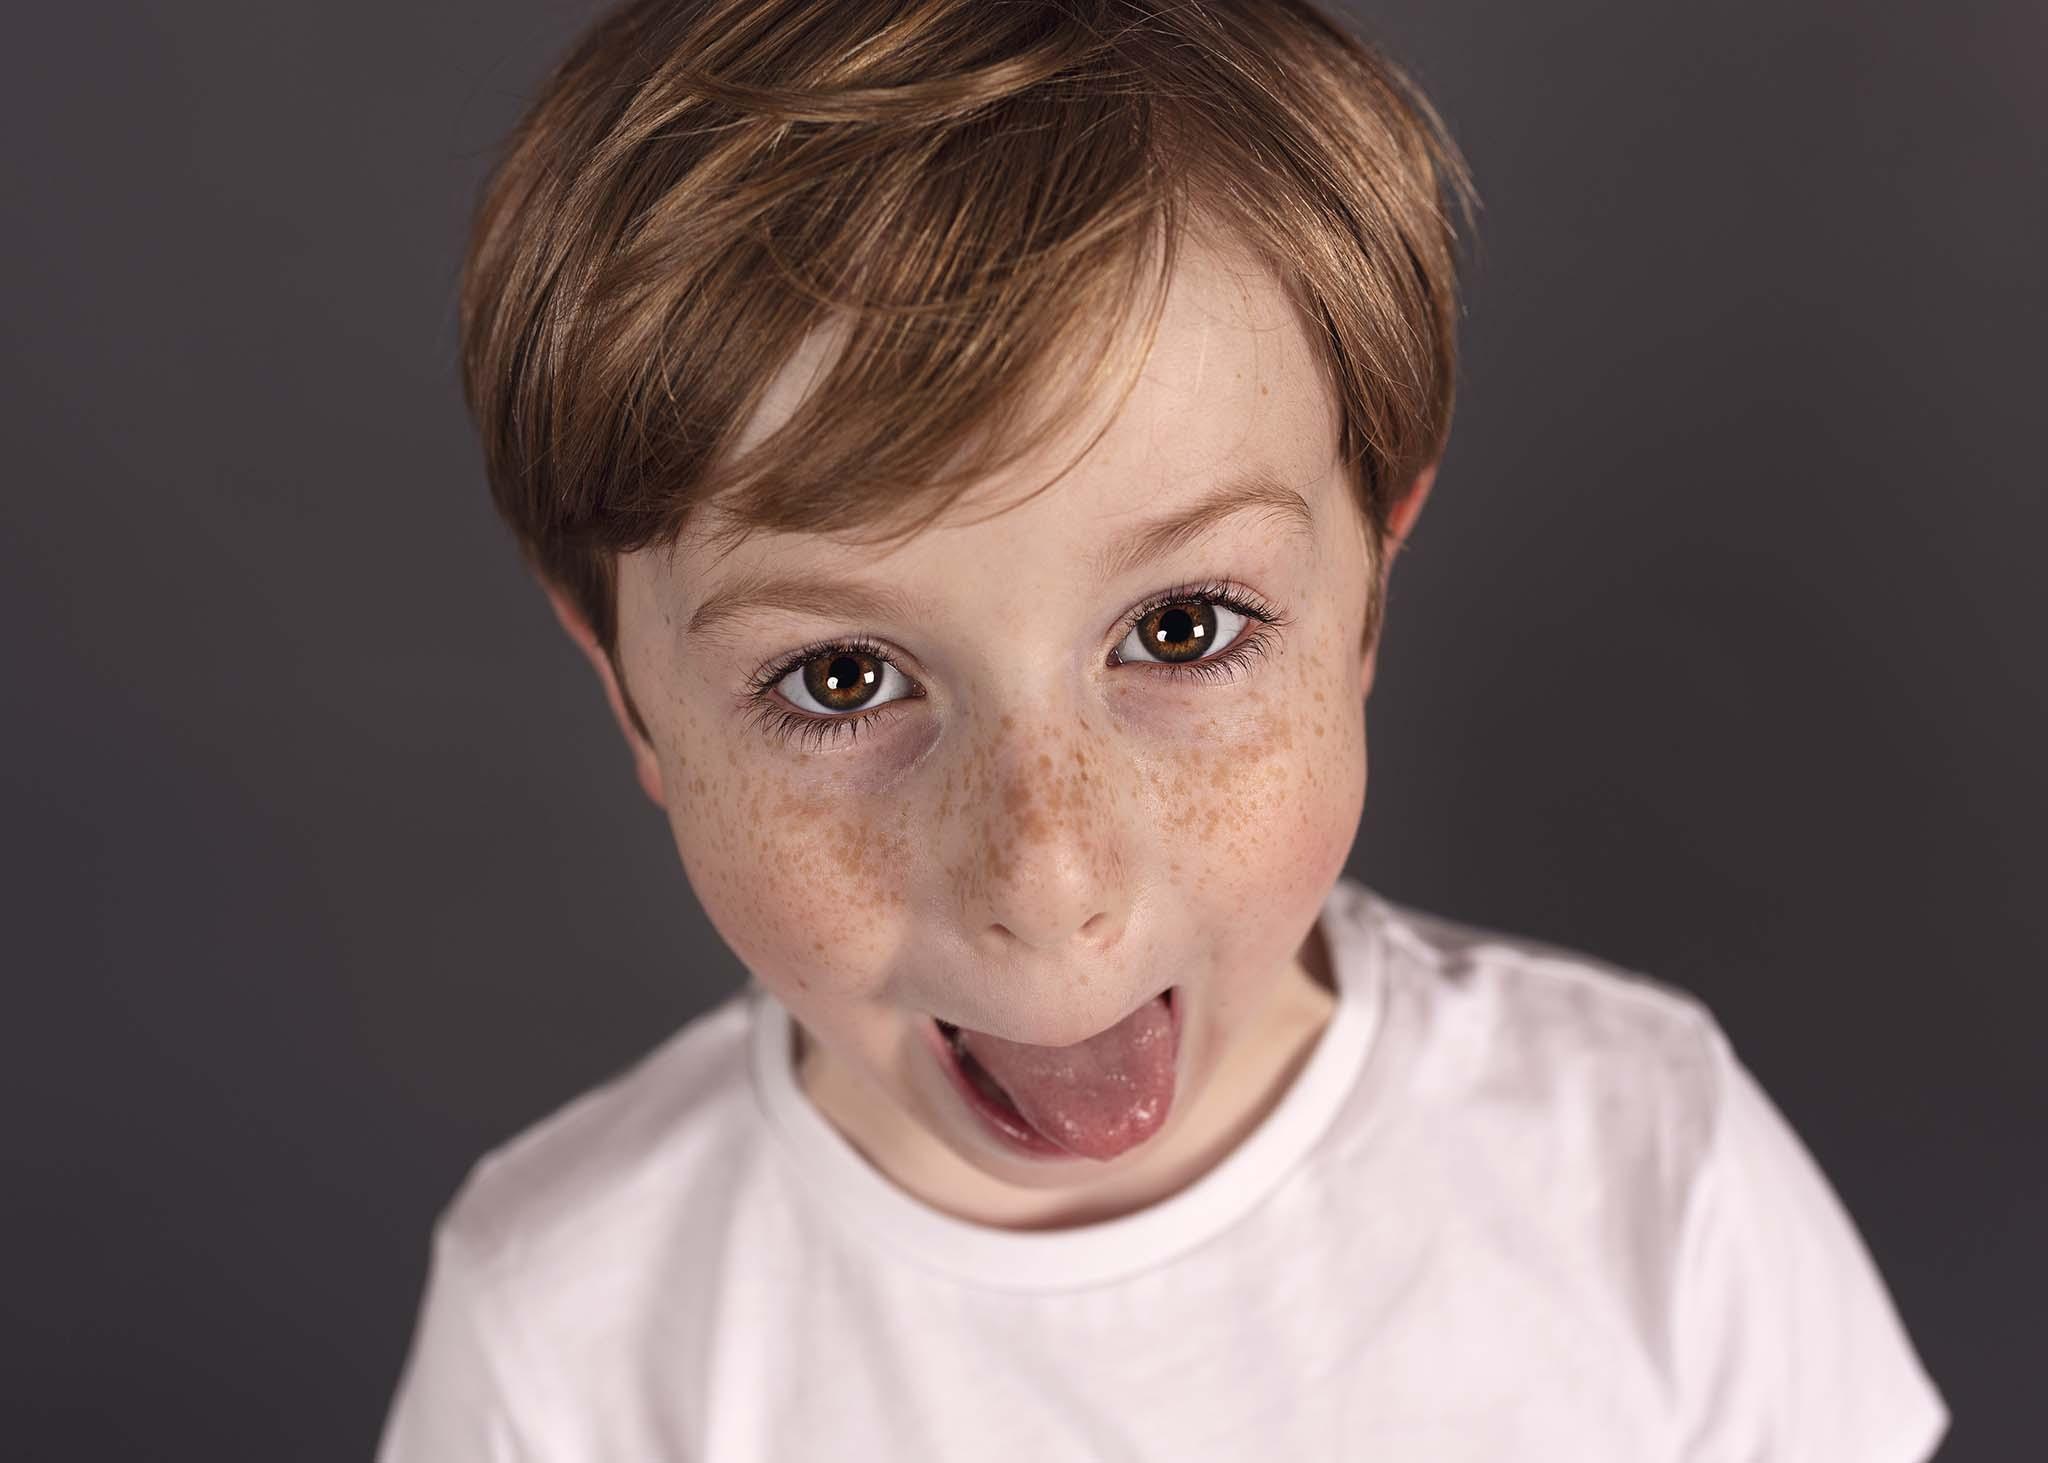 Photograph of children at Photoshoot in Edinburgh studio